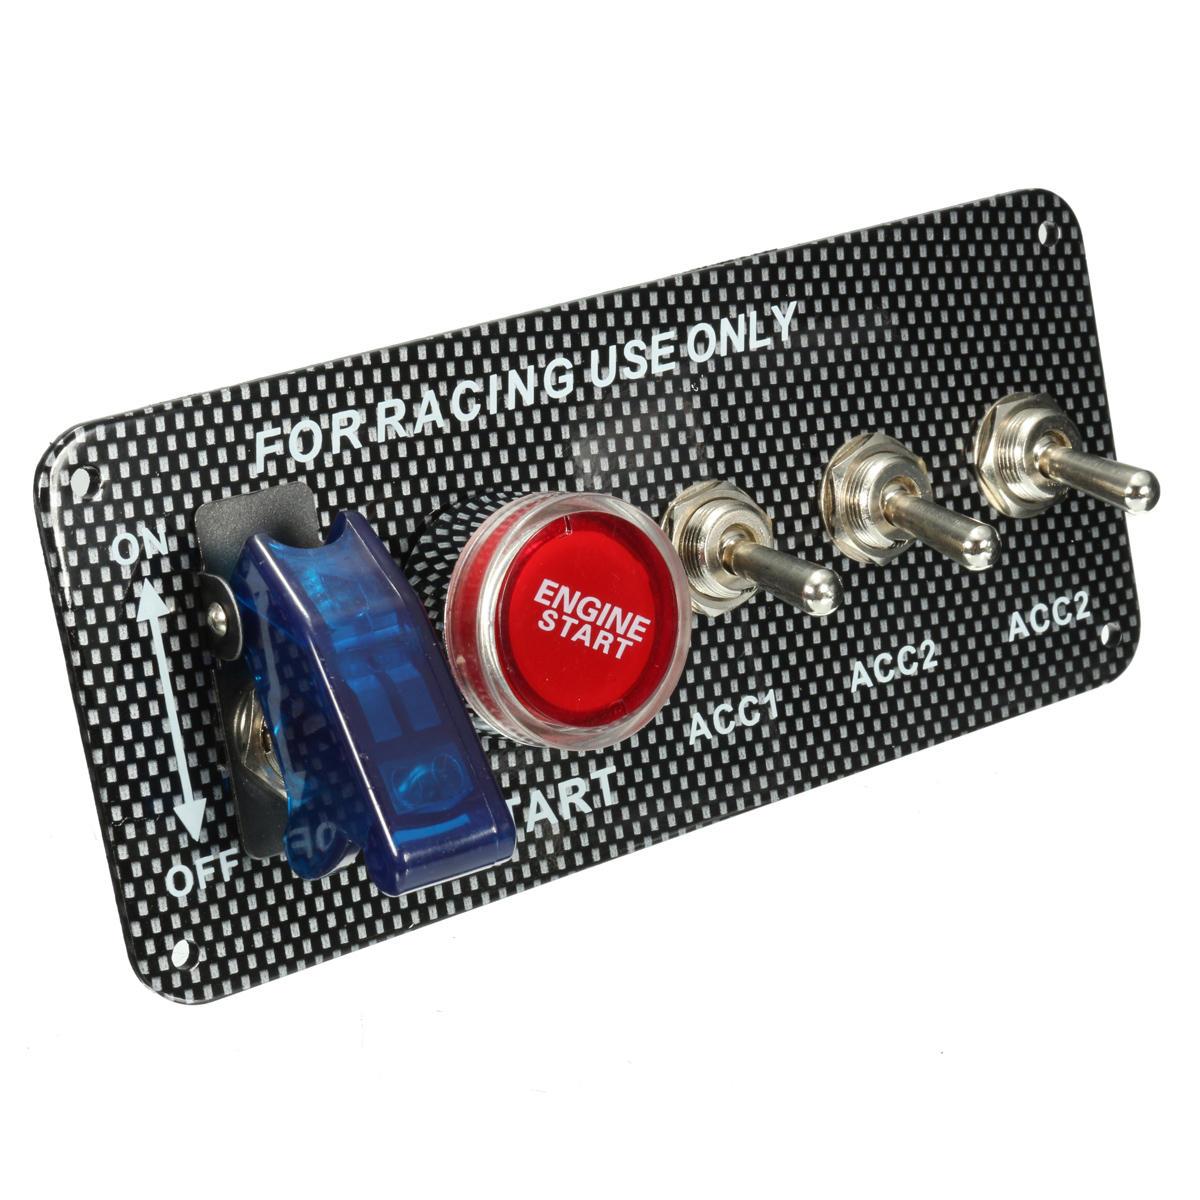 12V 20A LED Panel de interruptor de encendido de palanca Motor Botón de inicio Fibra de carbono Estilo Placa para Racing